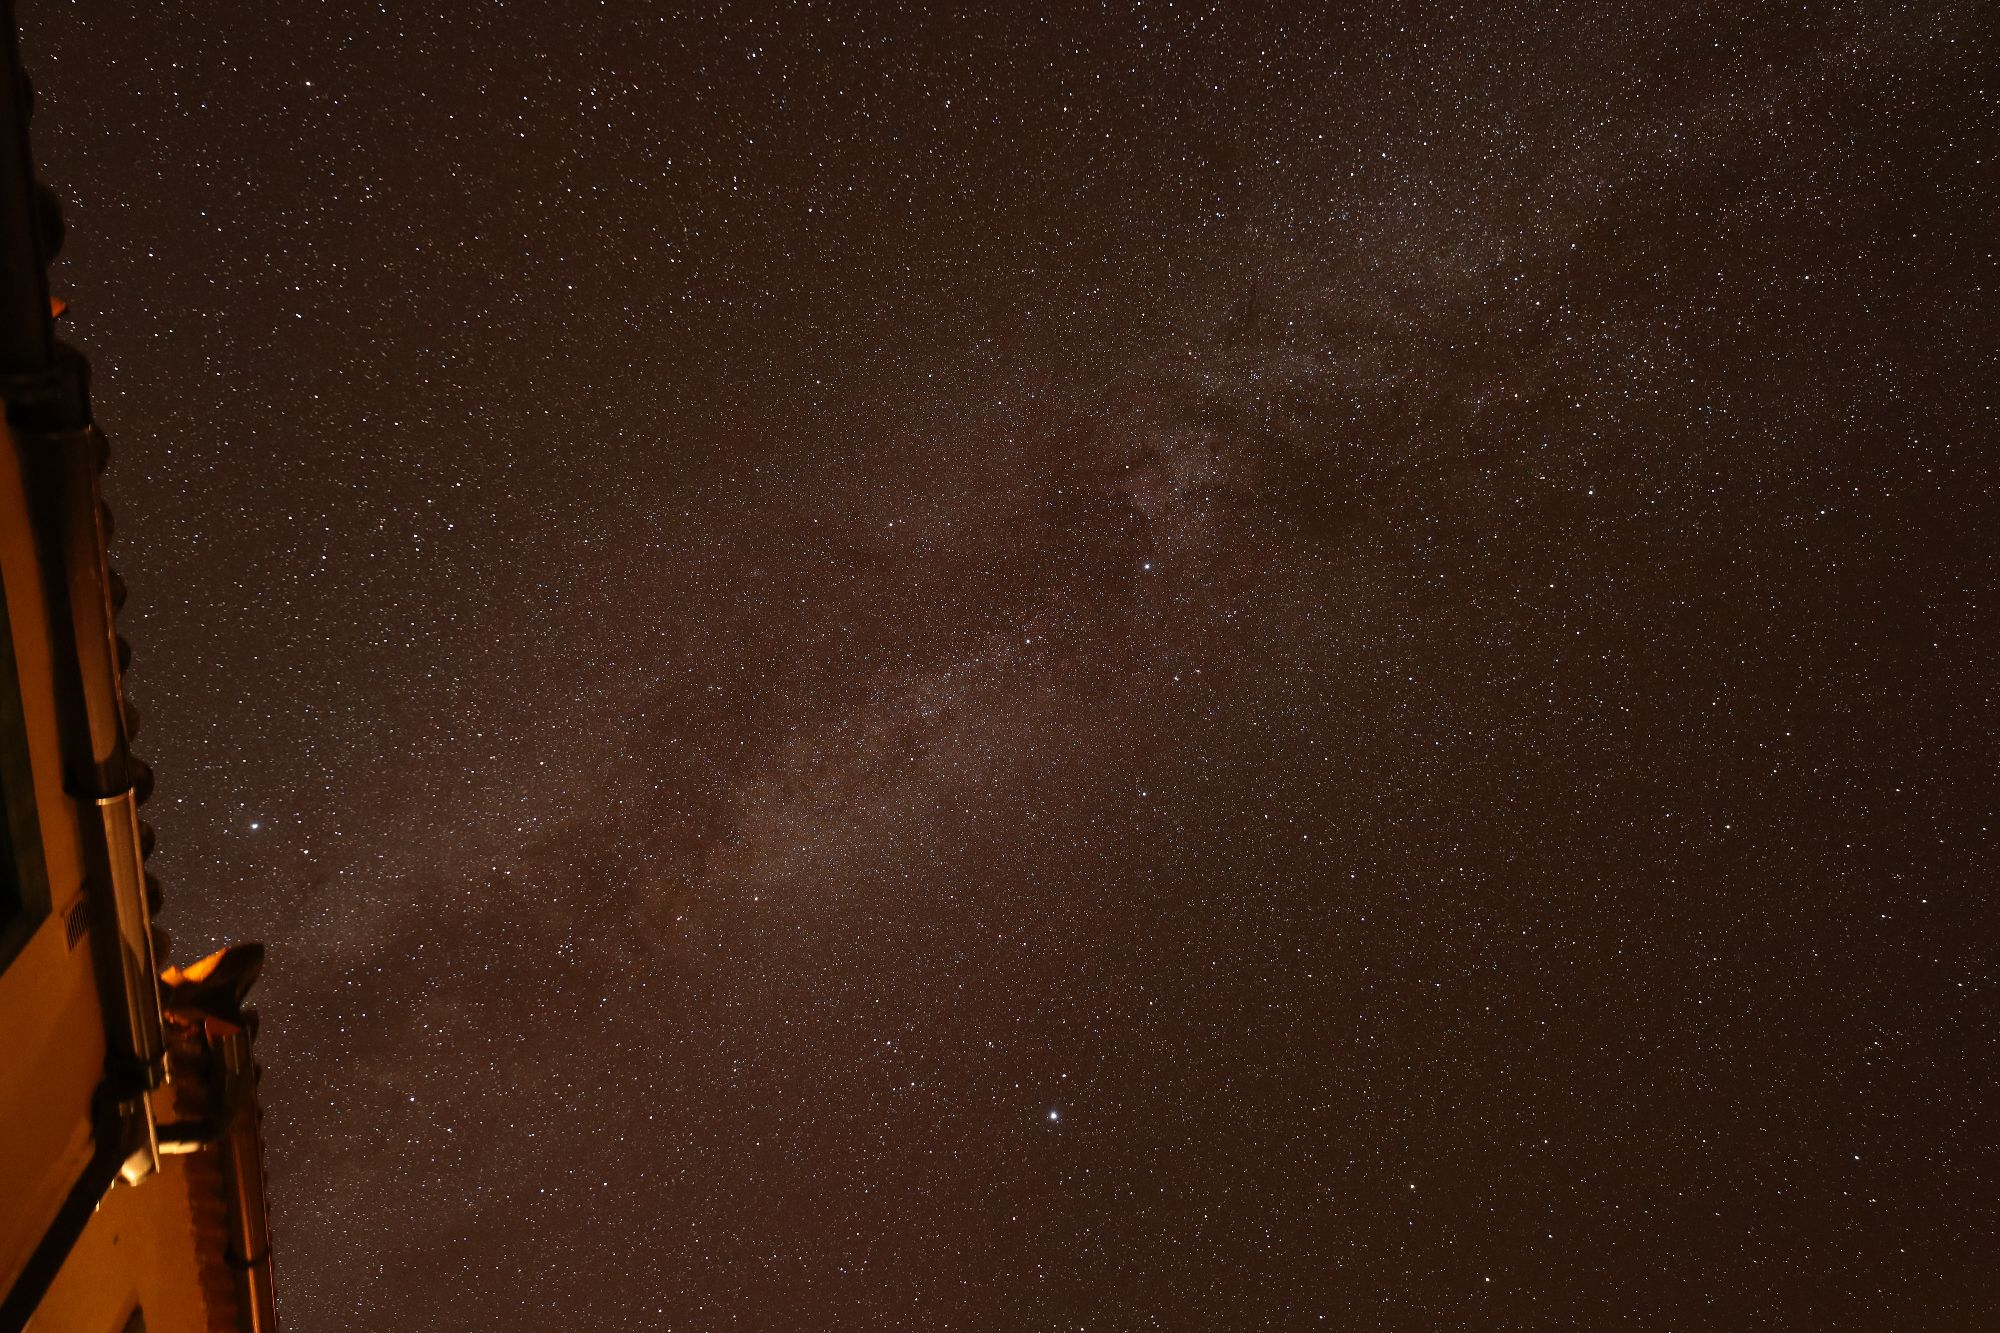 astronomy star gazing garafia la palma